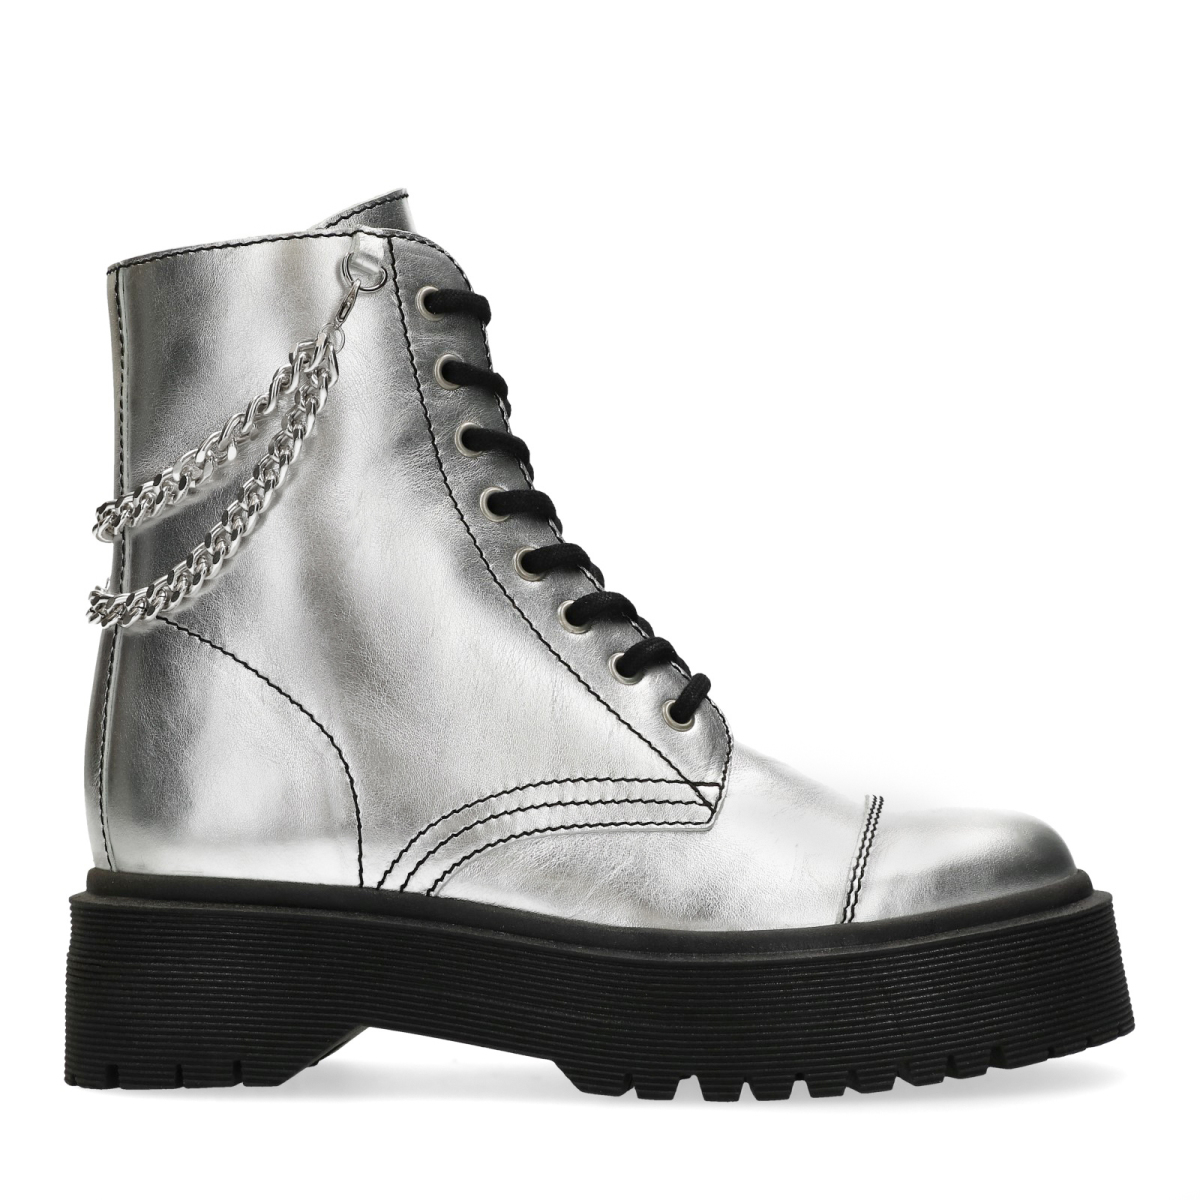 Metallic Marijezuurveldx Boots Sacha Sacha Biker lTcK1JF